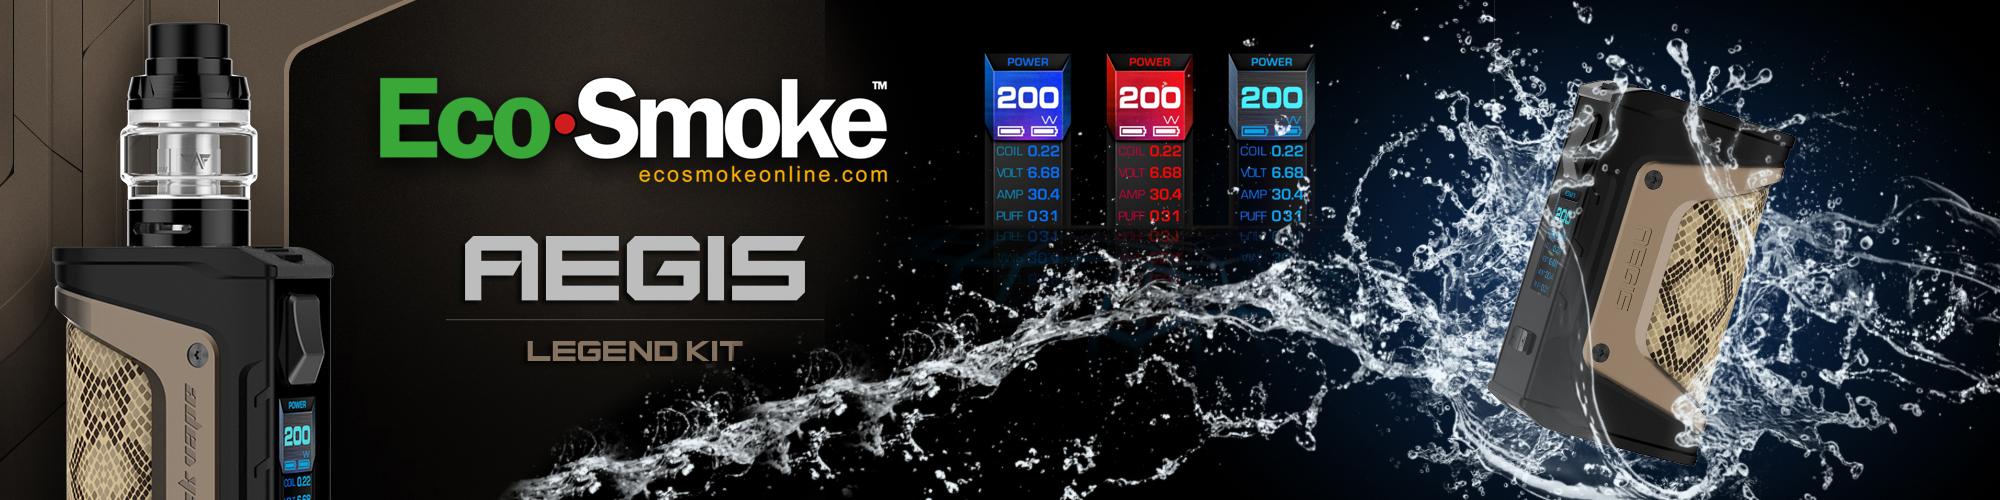 EcoSmoke Online banner 1